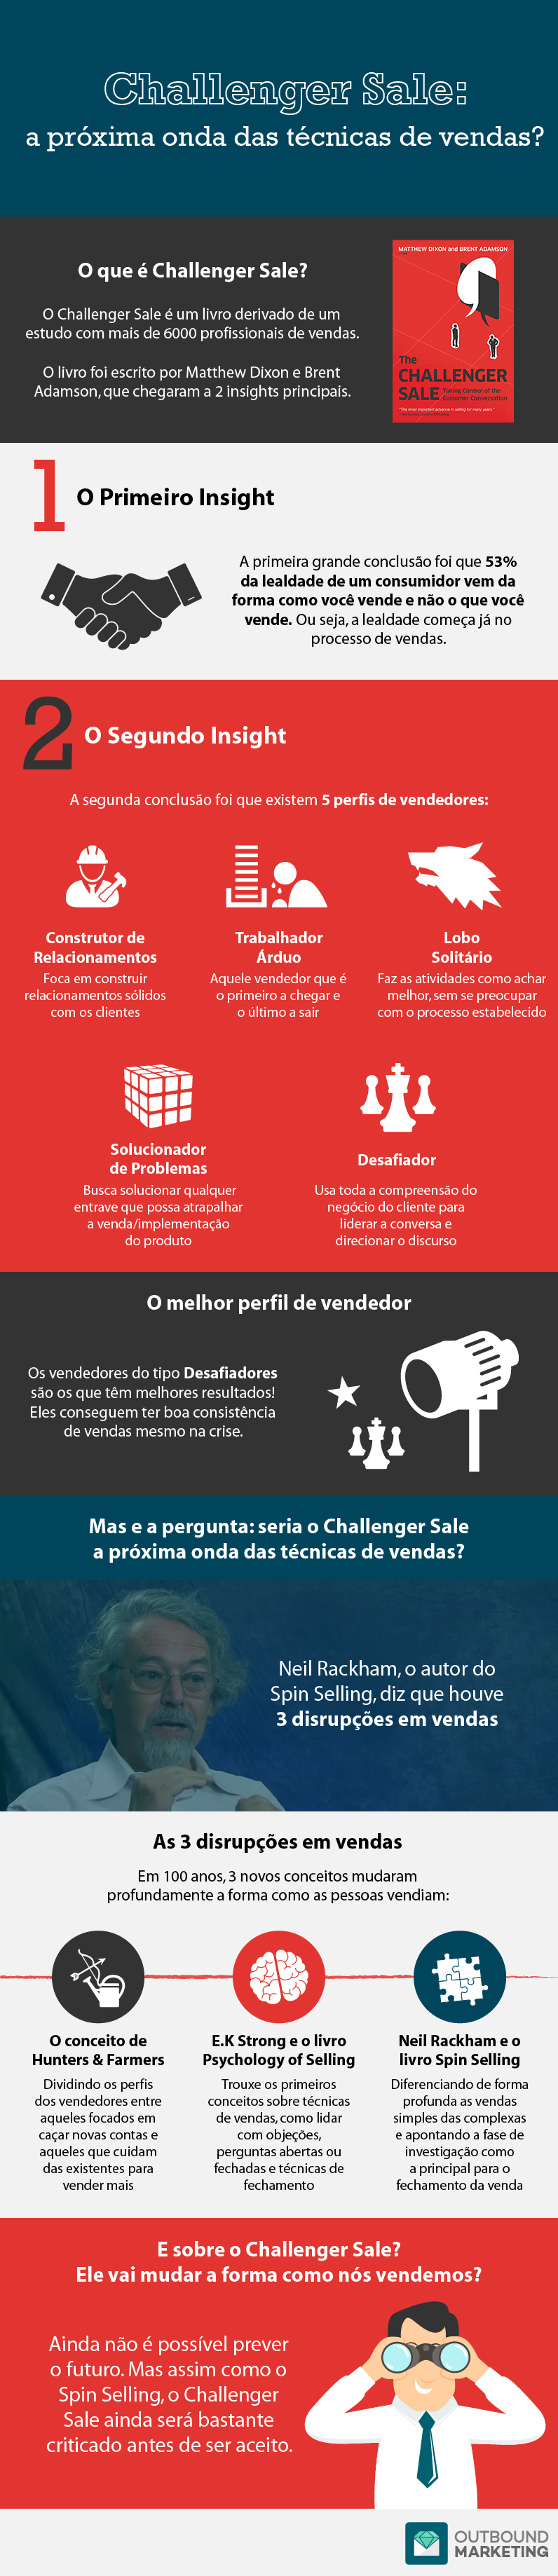 inforafico-Challenger-Sale